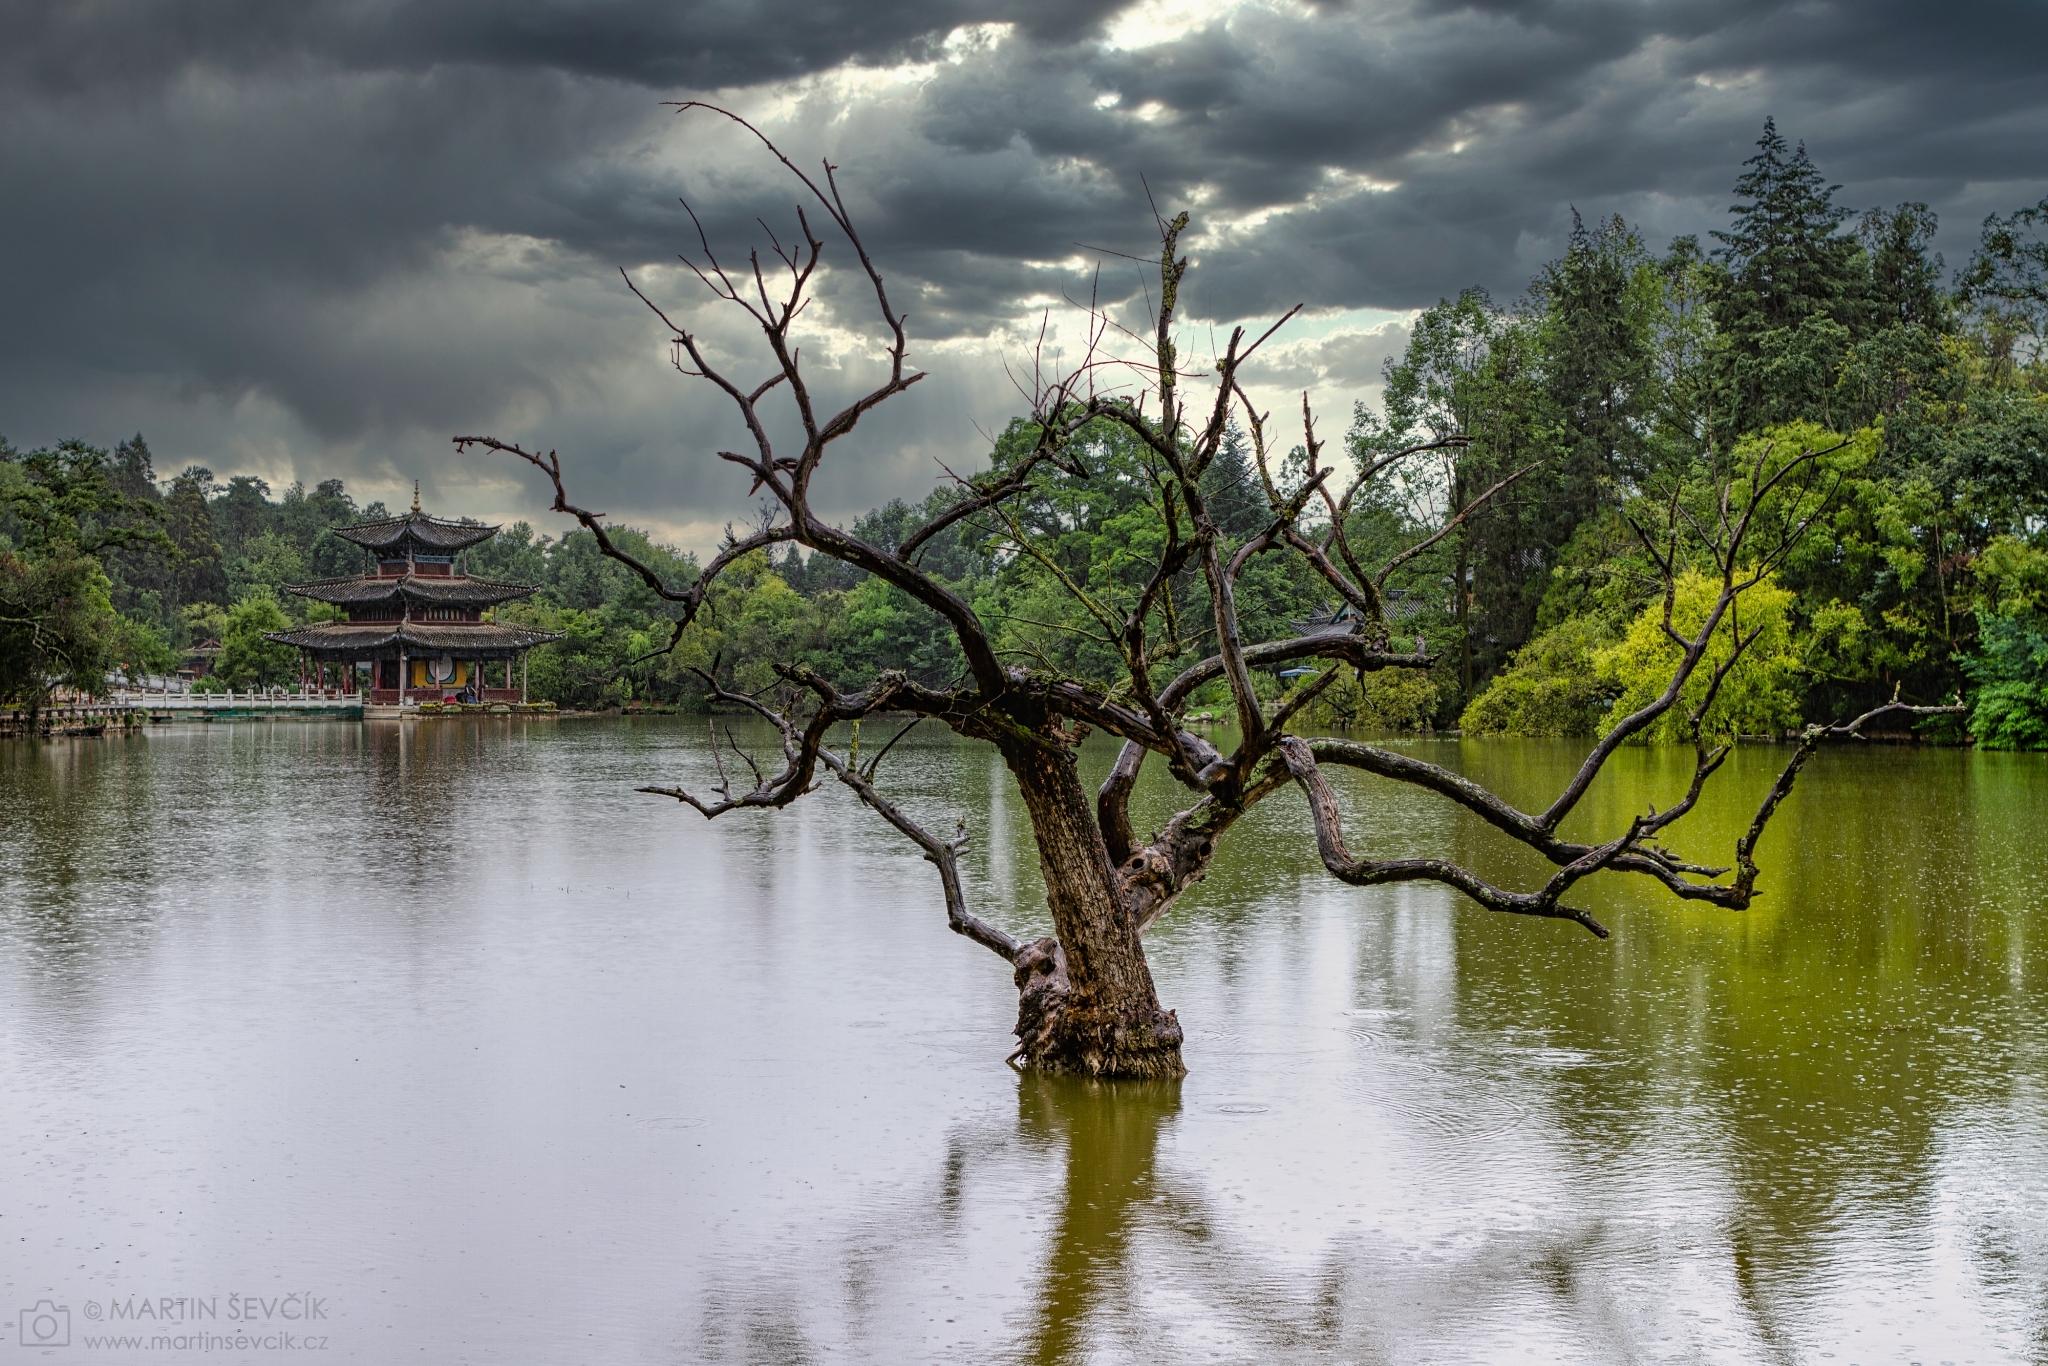 Dead tree in the Black Dragon Pool Park in the rain